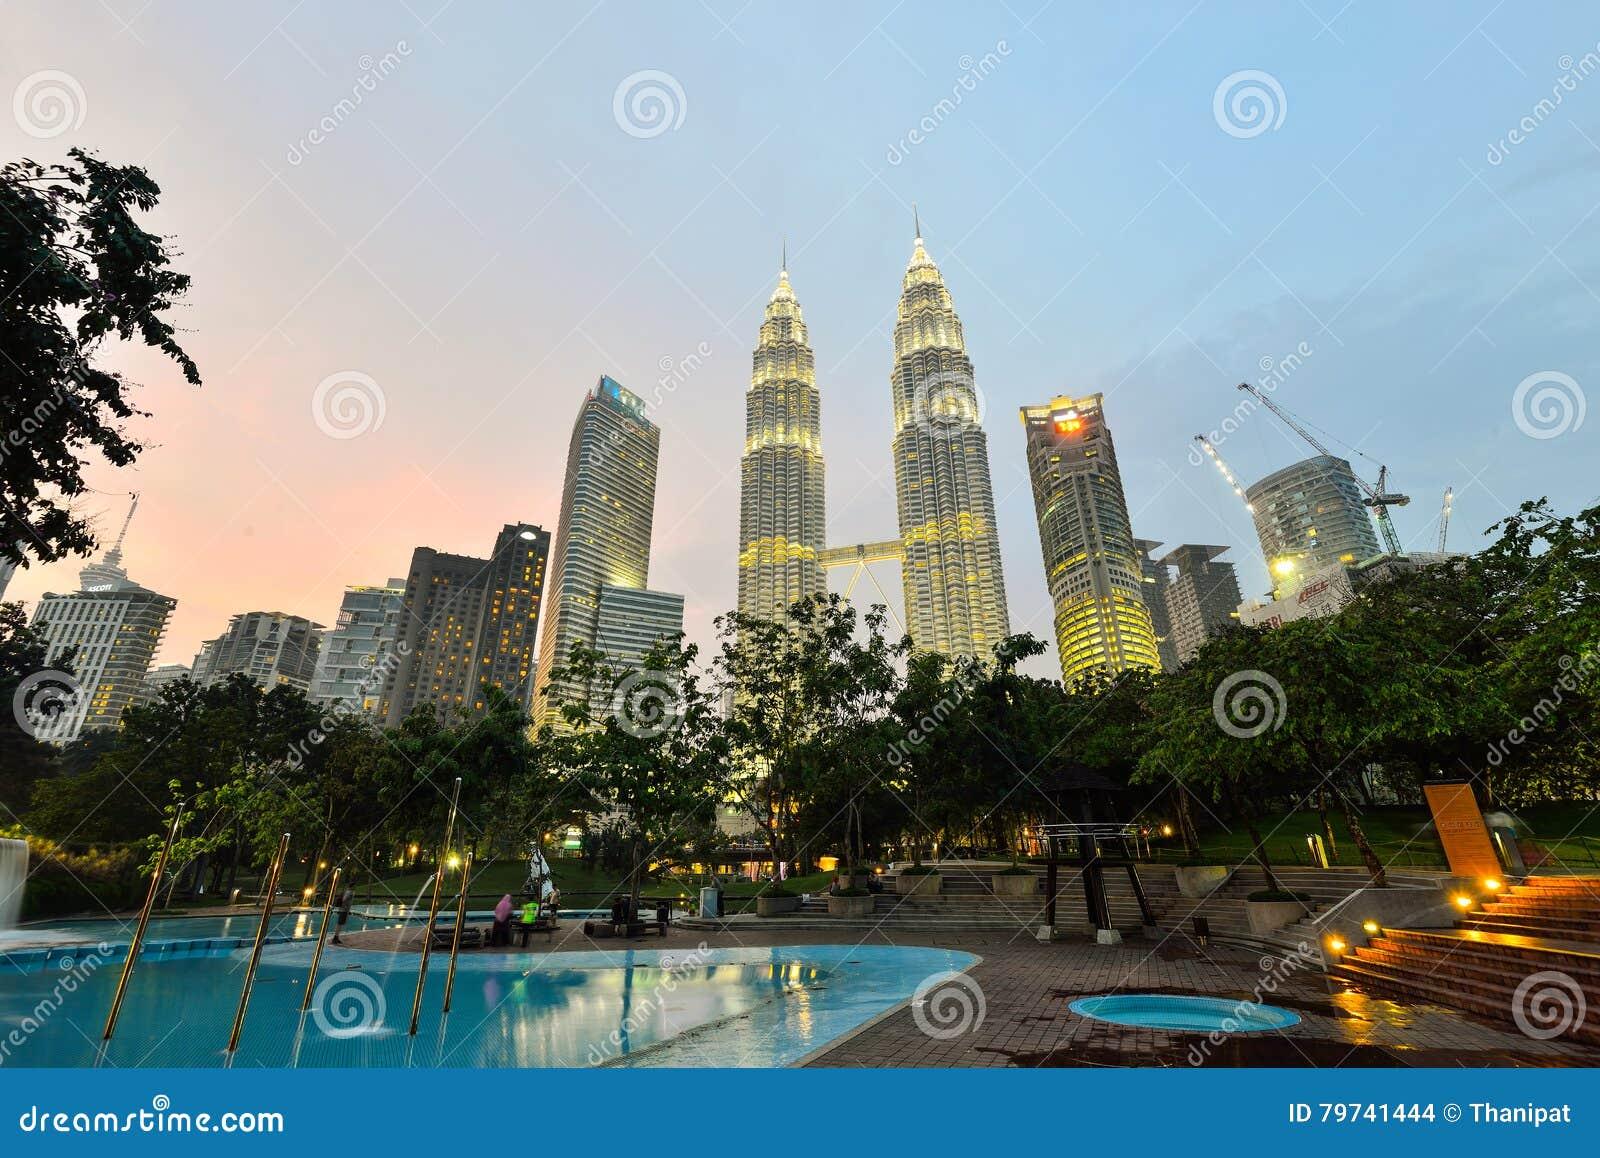 Torre gemela en el crepúsculo en Kuala Lumpur, Malasia